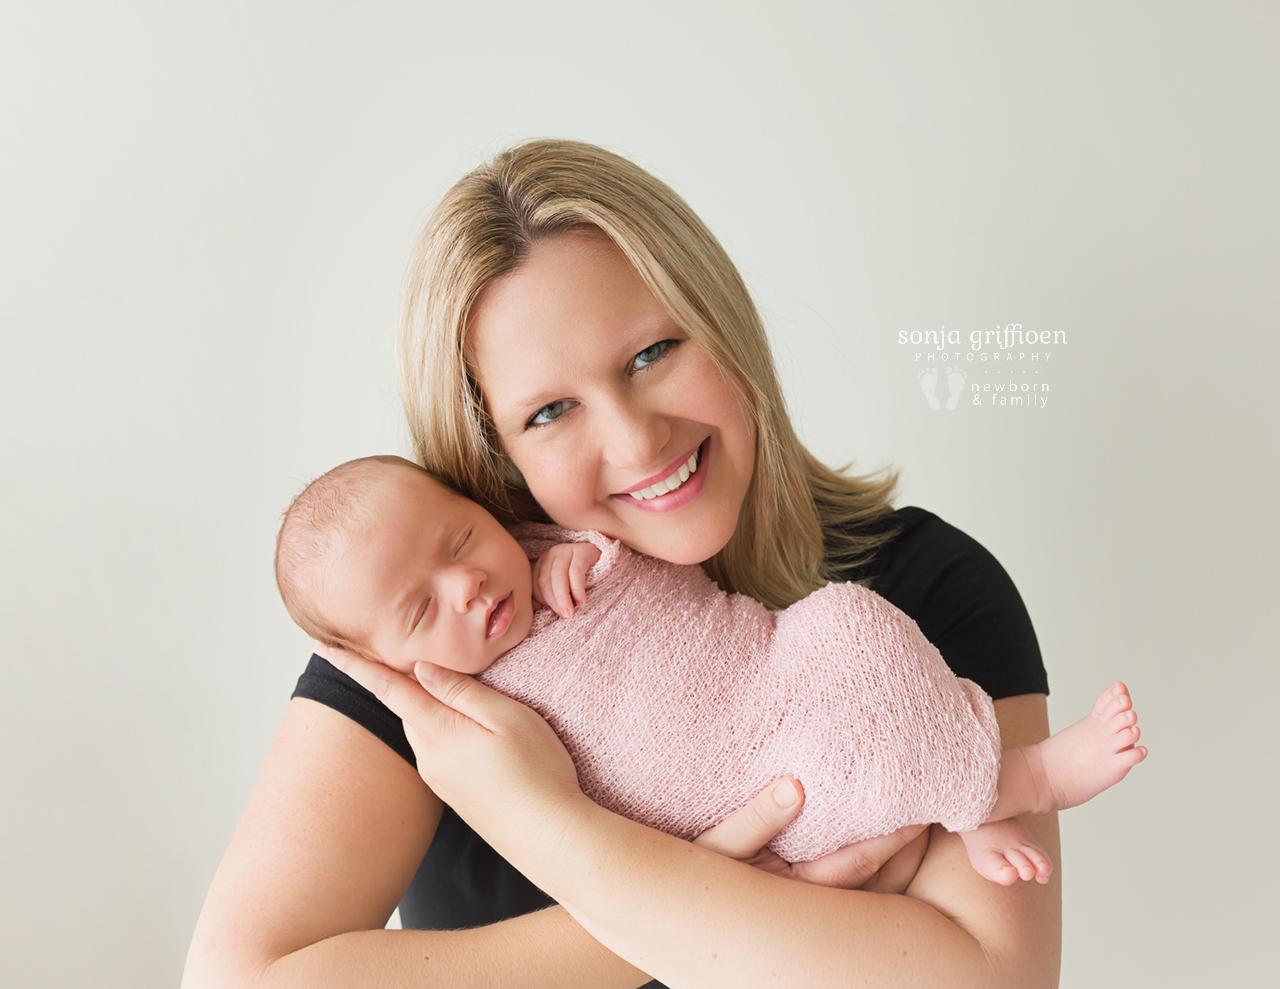 Veronica-Newborn-Brisbane-Newborn-Photographer-Sonja-Griffioen-02.jpg